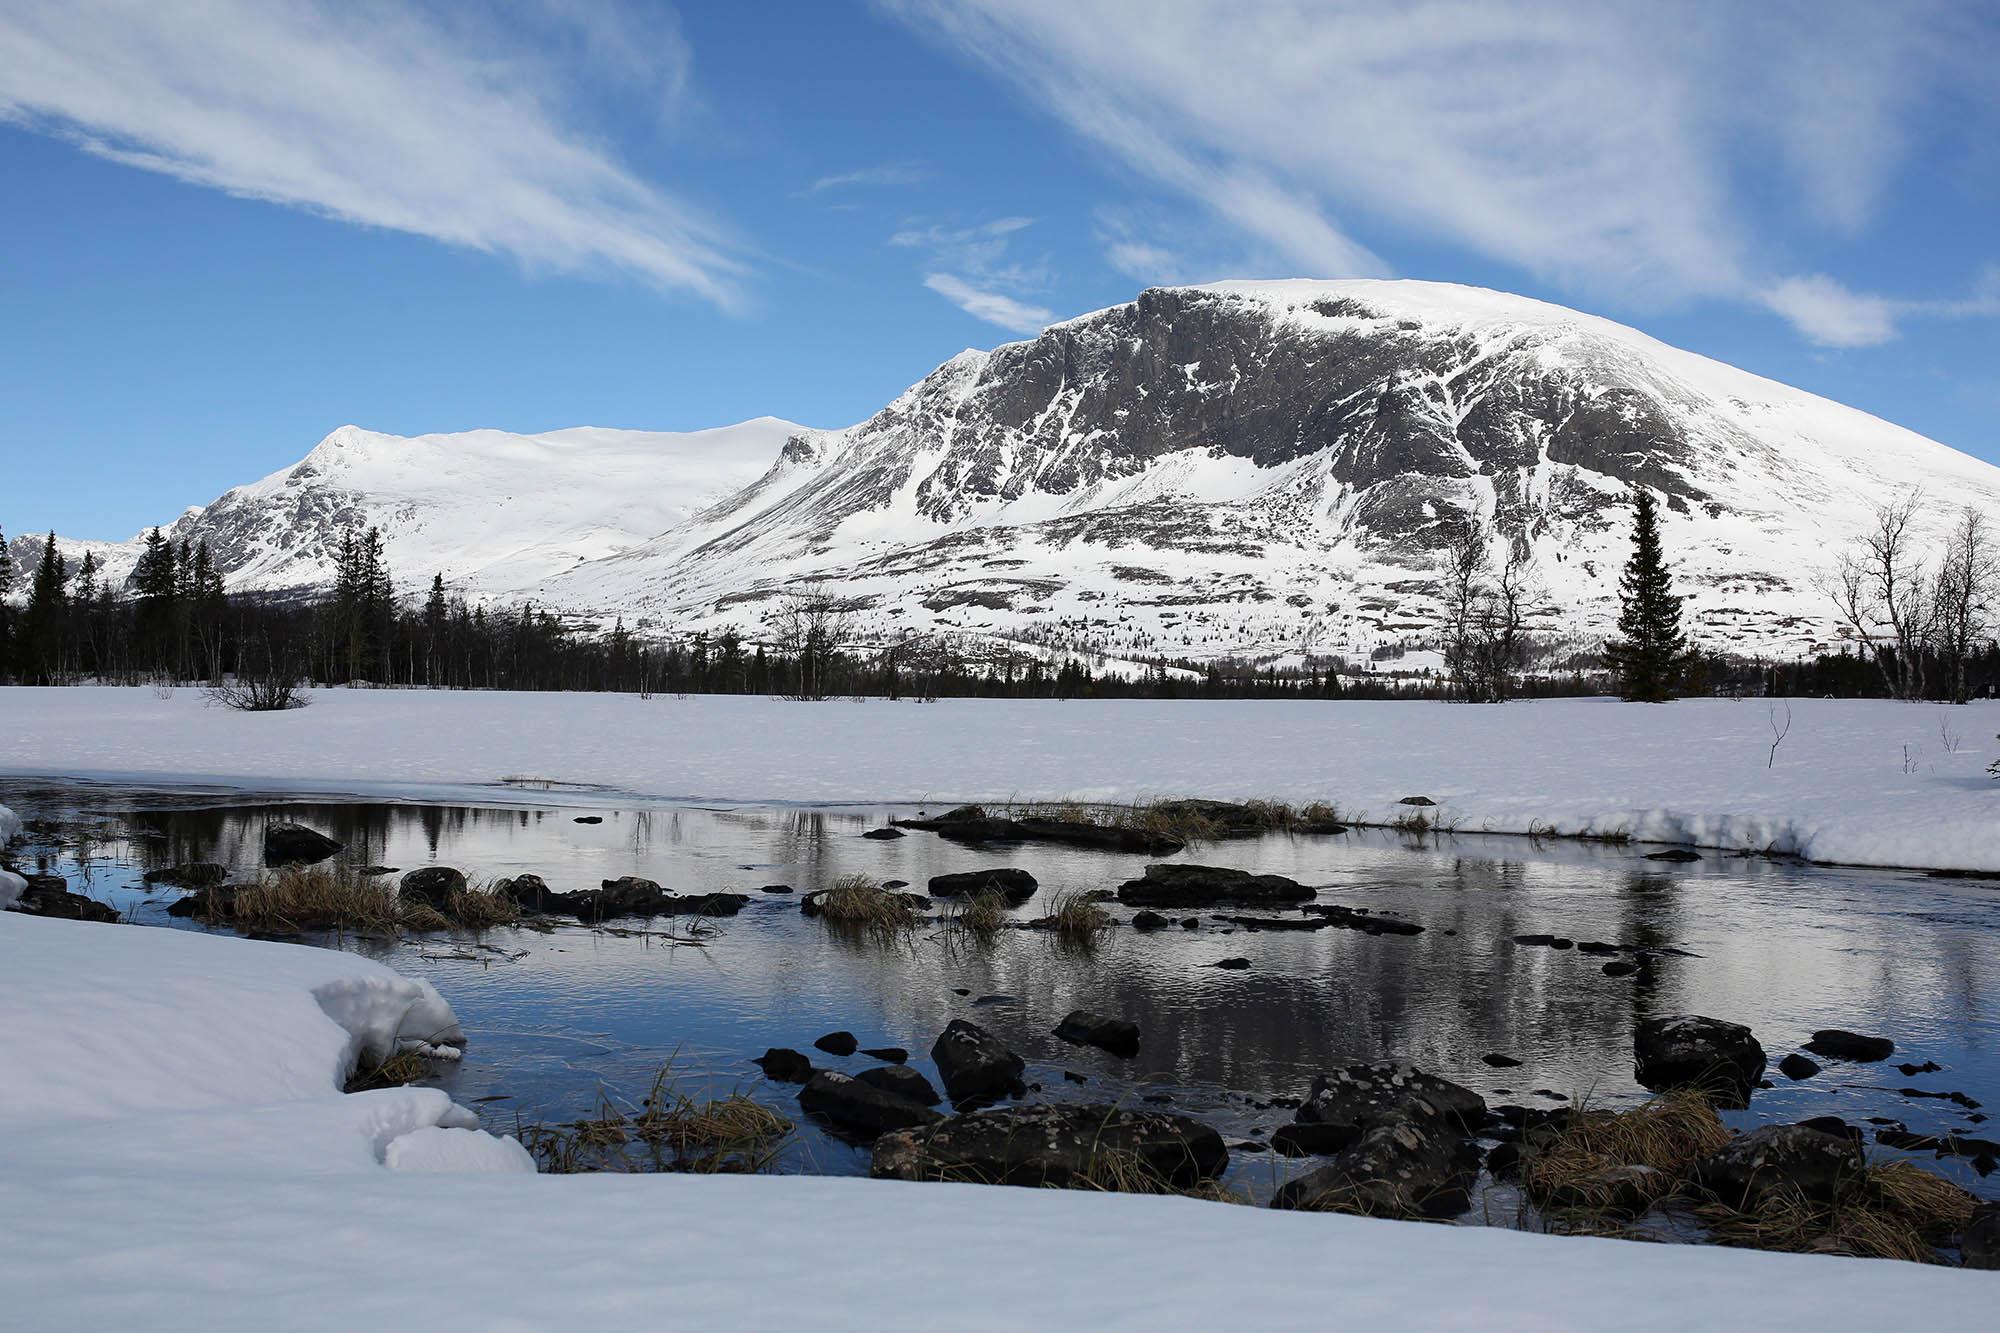 snowy & charming Lykkja